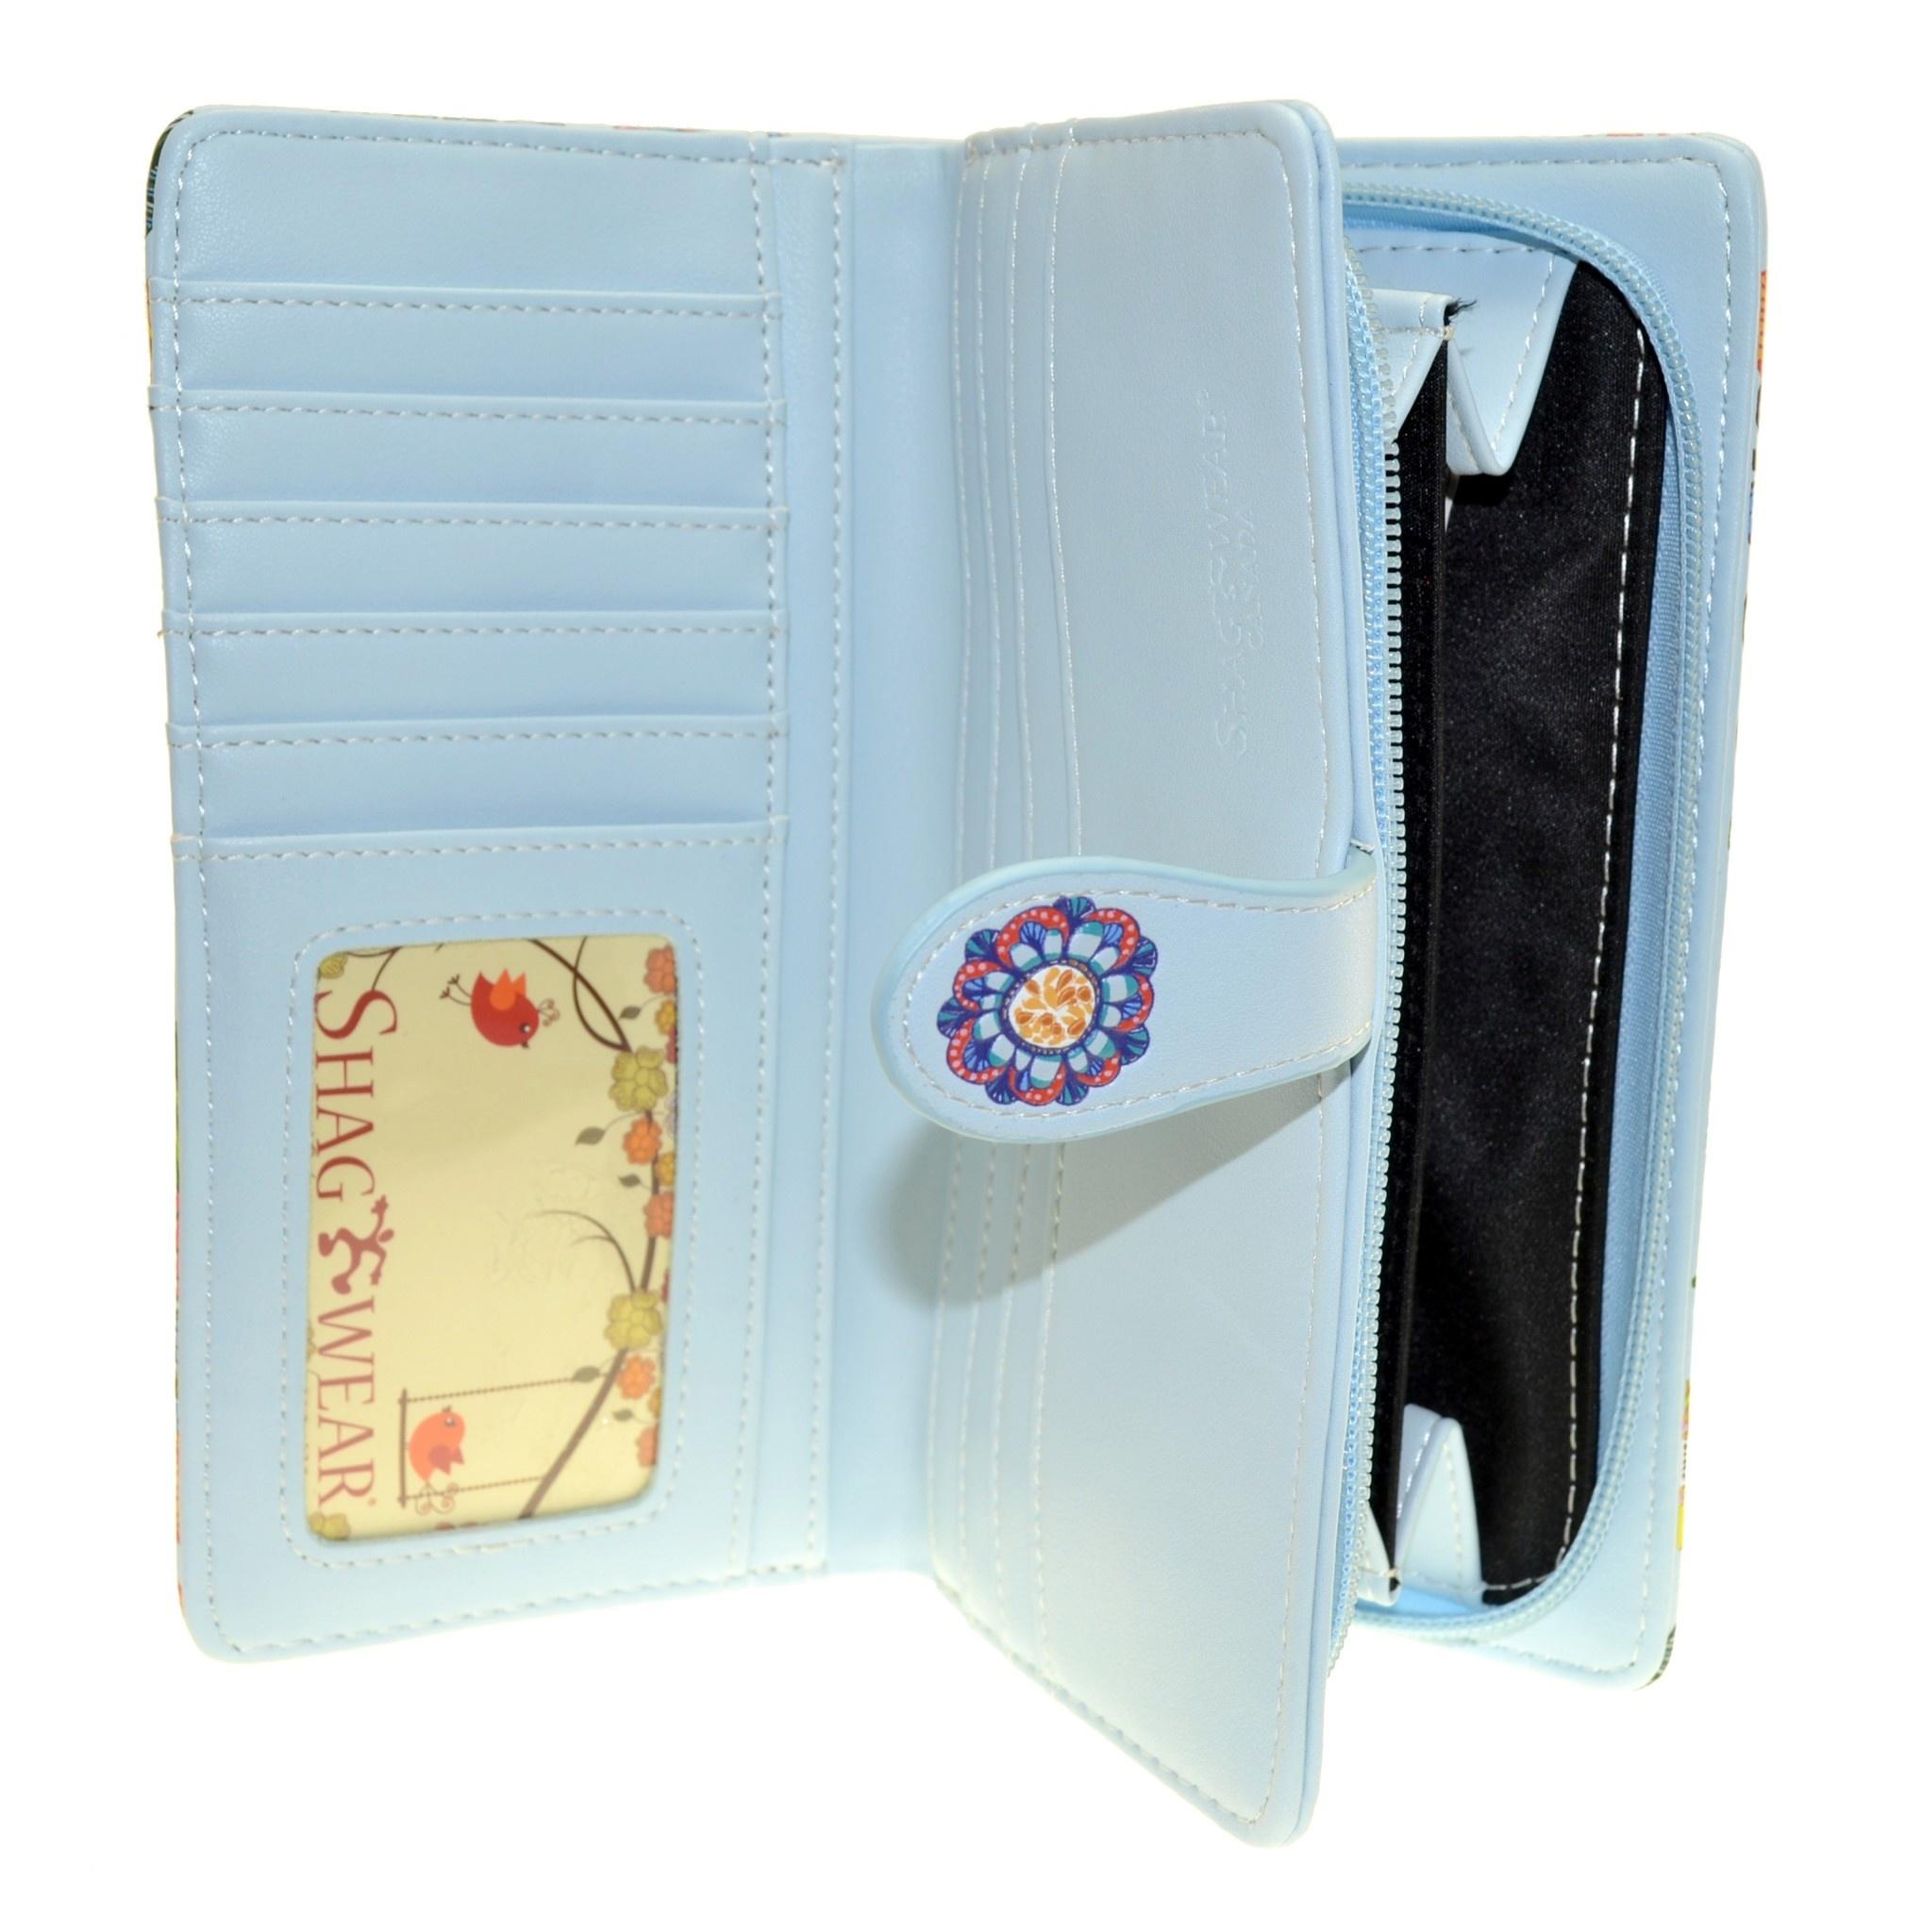 Shagwear Wallet/ Large, Love Floral Light Blue